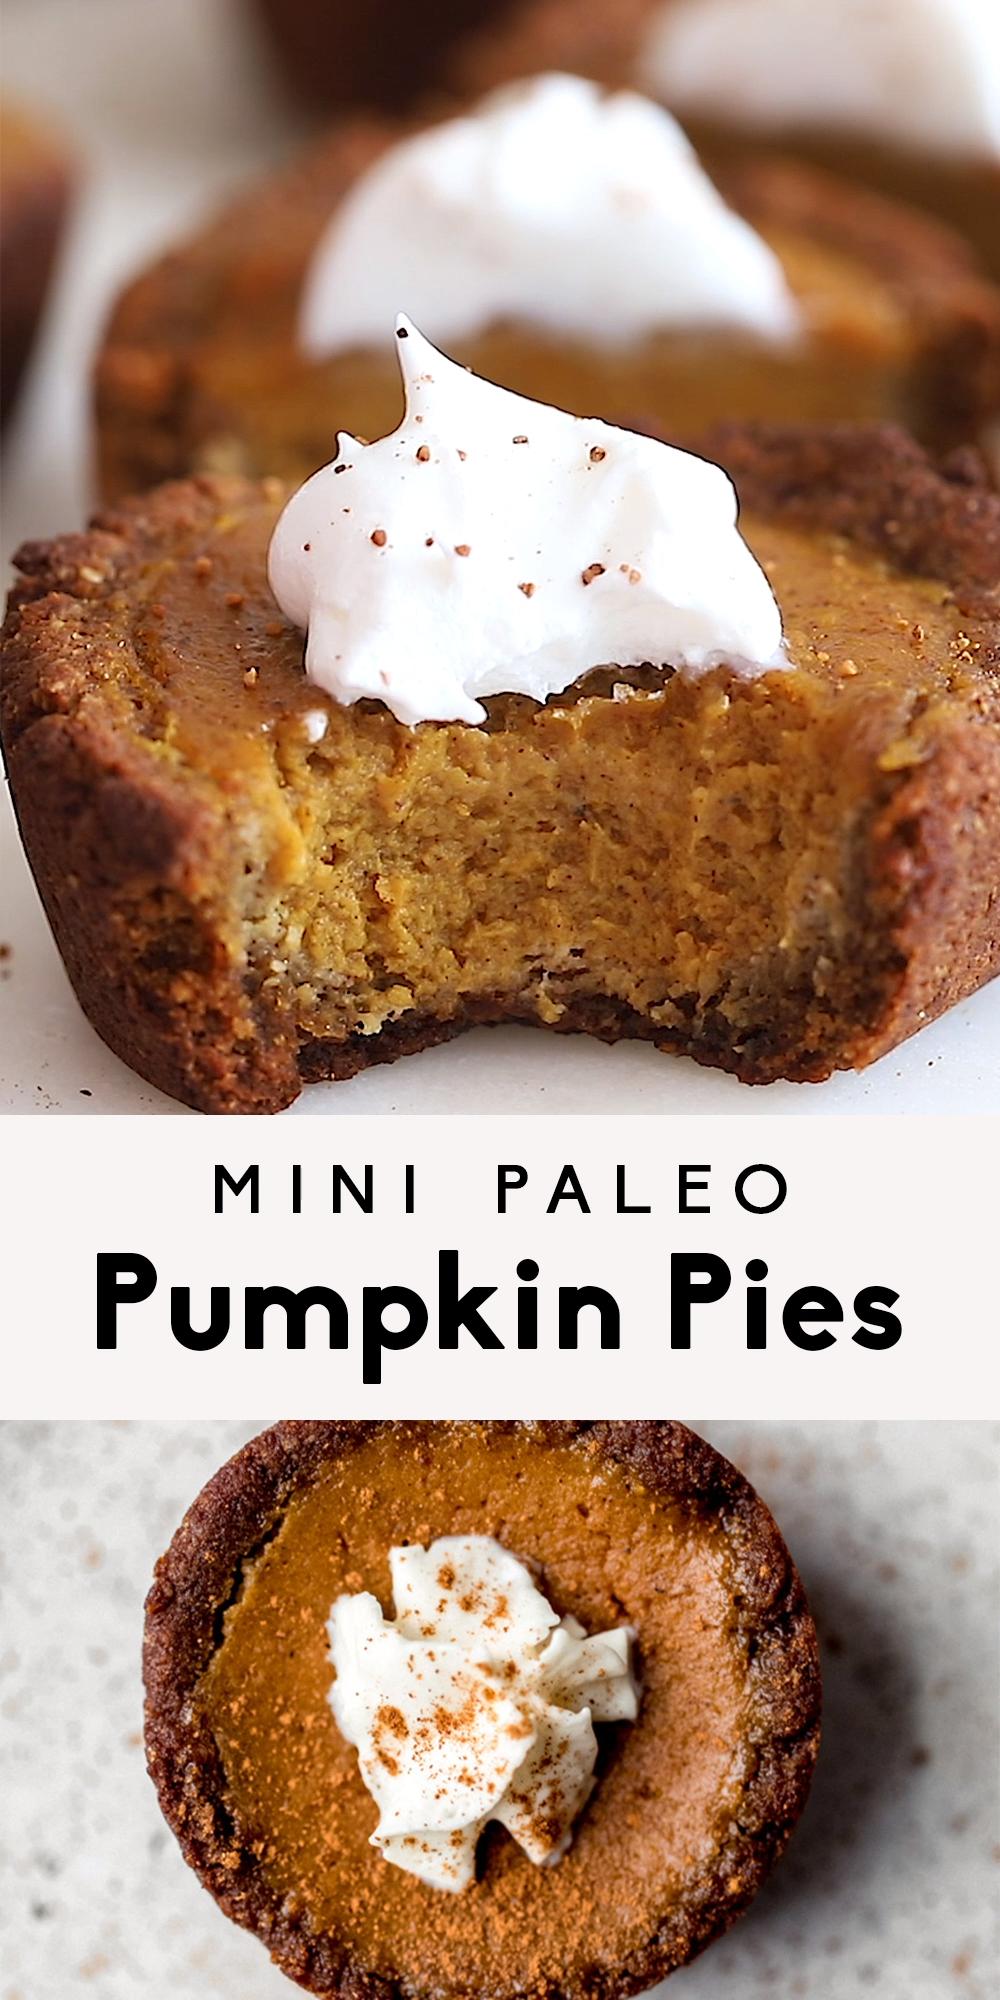 Mini Paleo Pumpkin Pies with Gingerbread Cookie Crust -   18 desserts Gluten Free glutenfree ideas